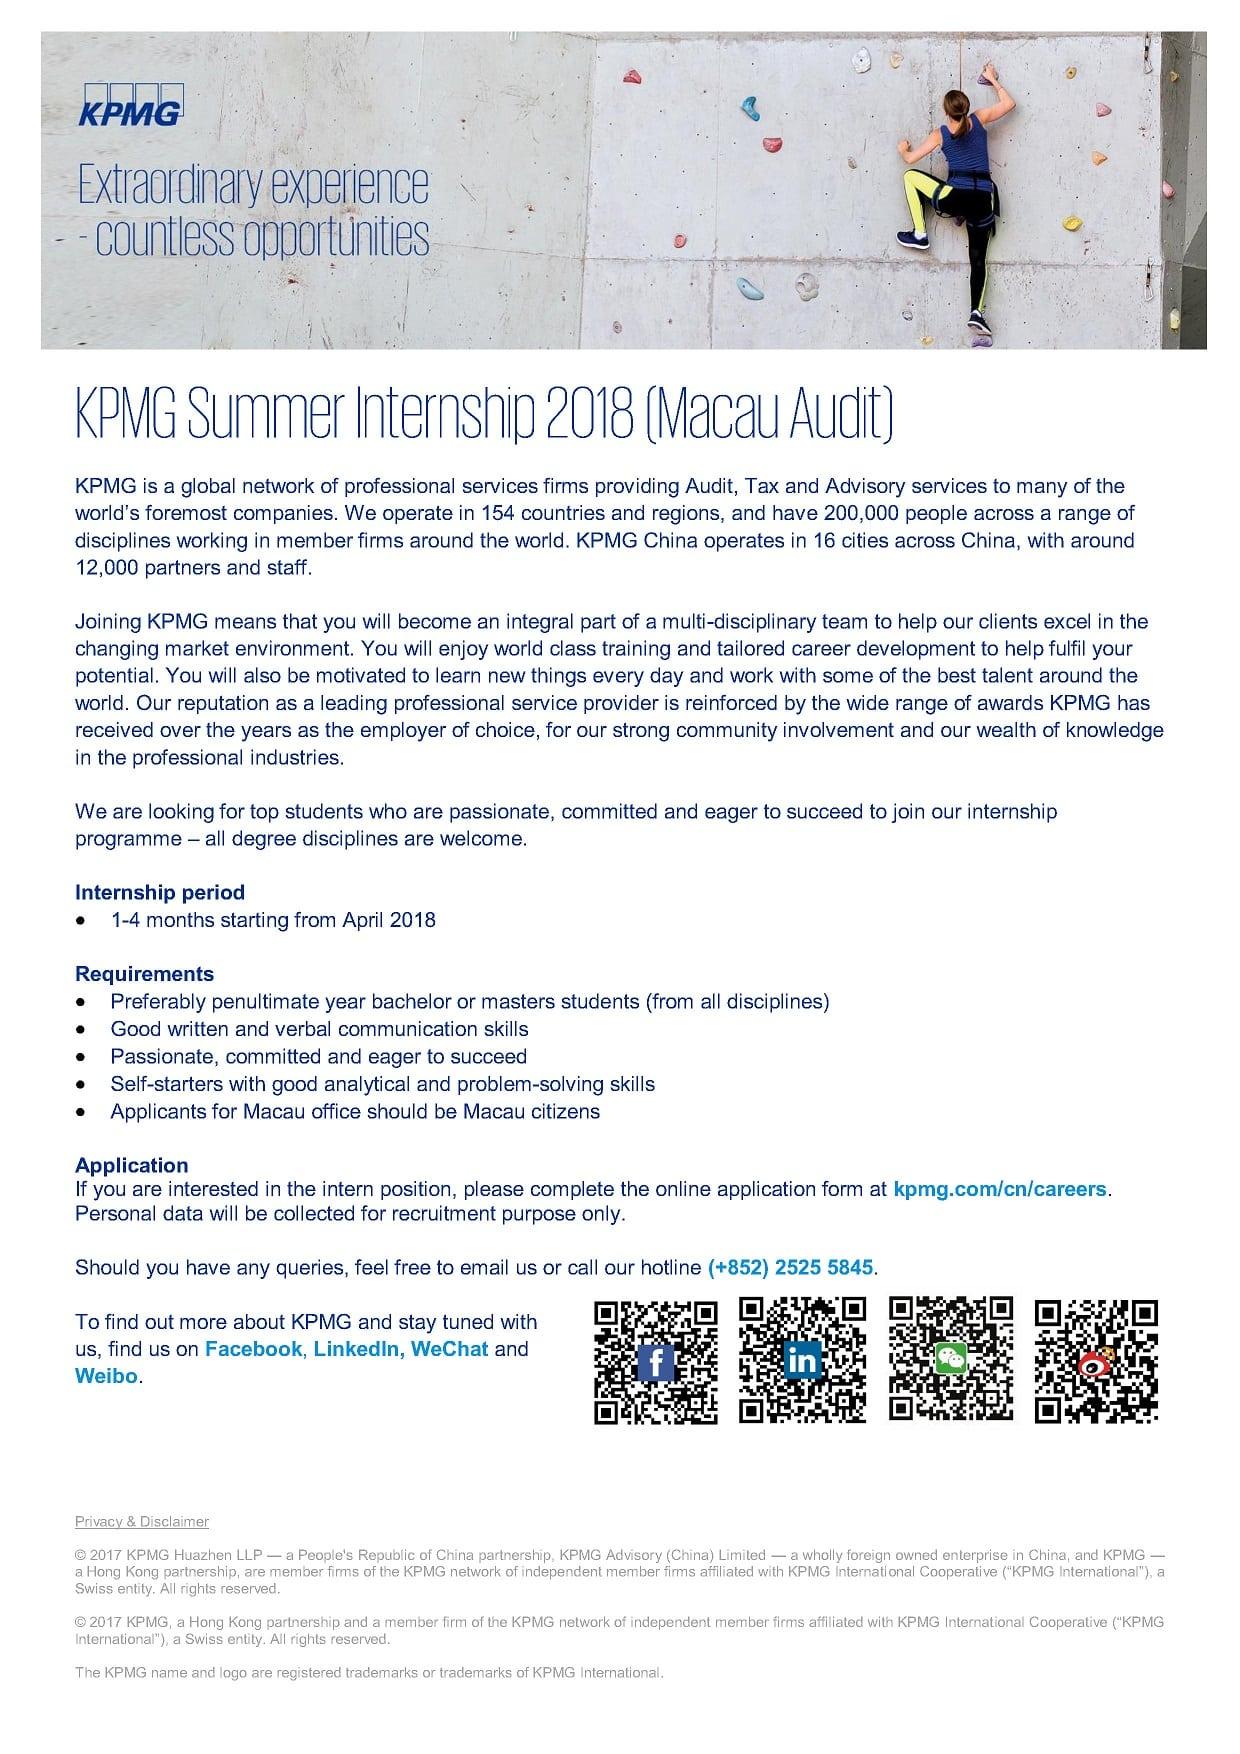 KPMG Summer Internship 2018 (Macau Audit) - Faculty of